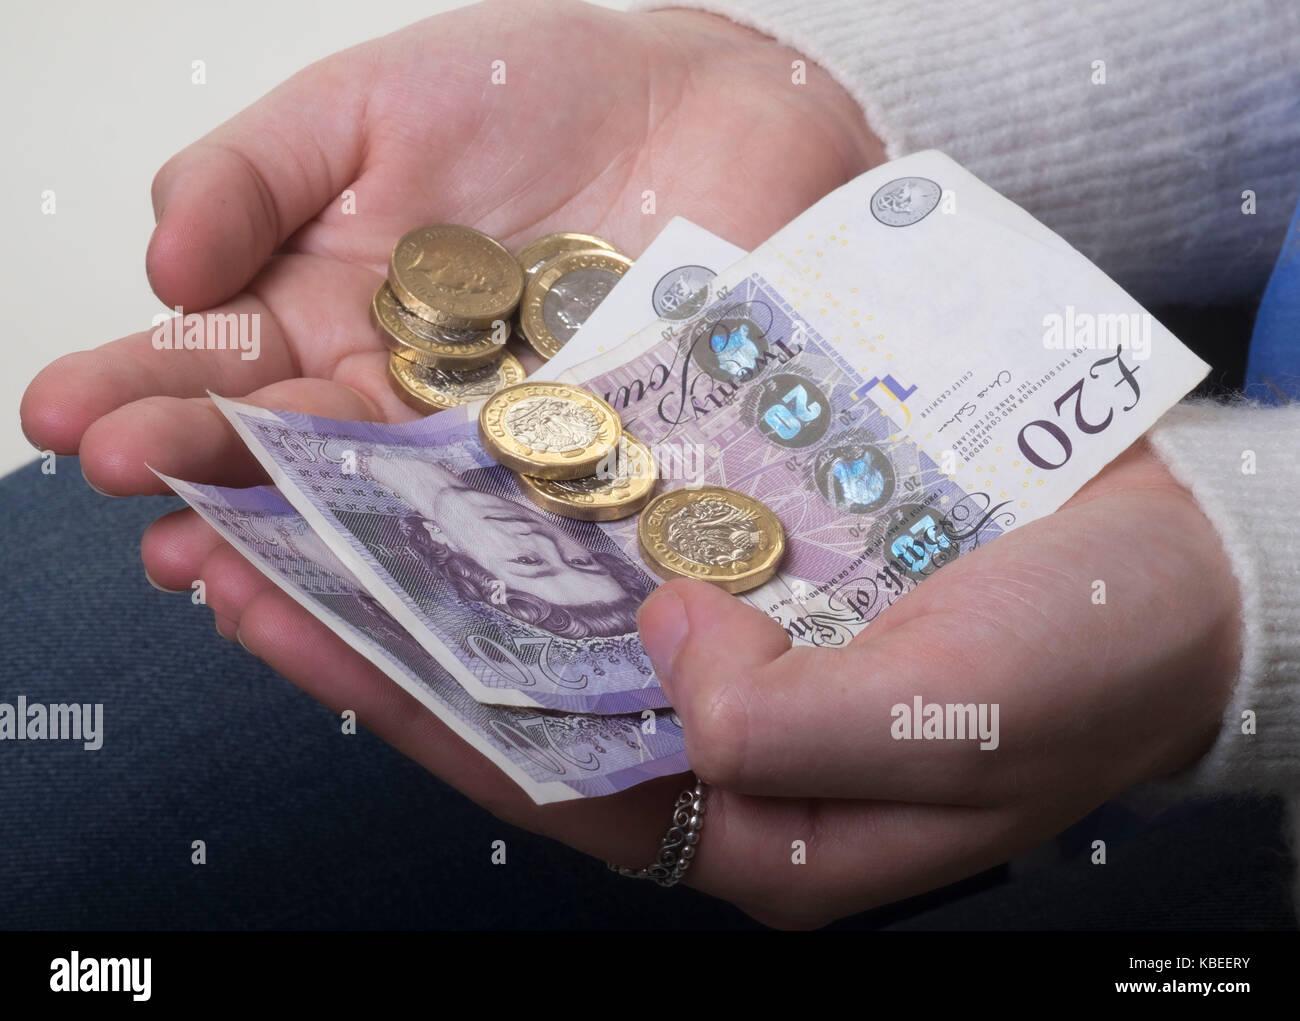 Money worries - Stock Image